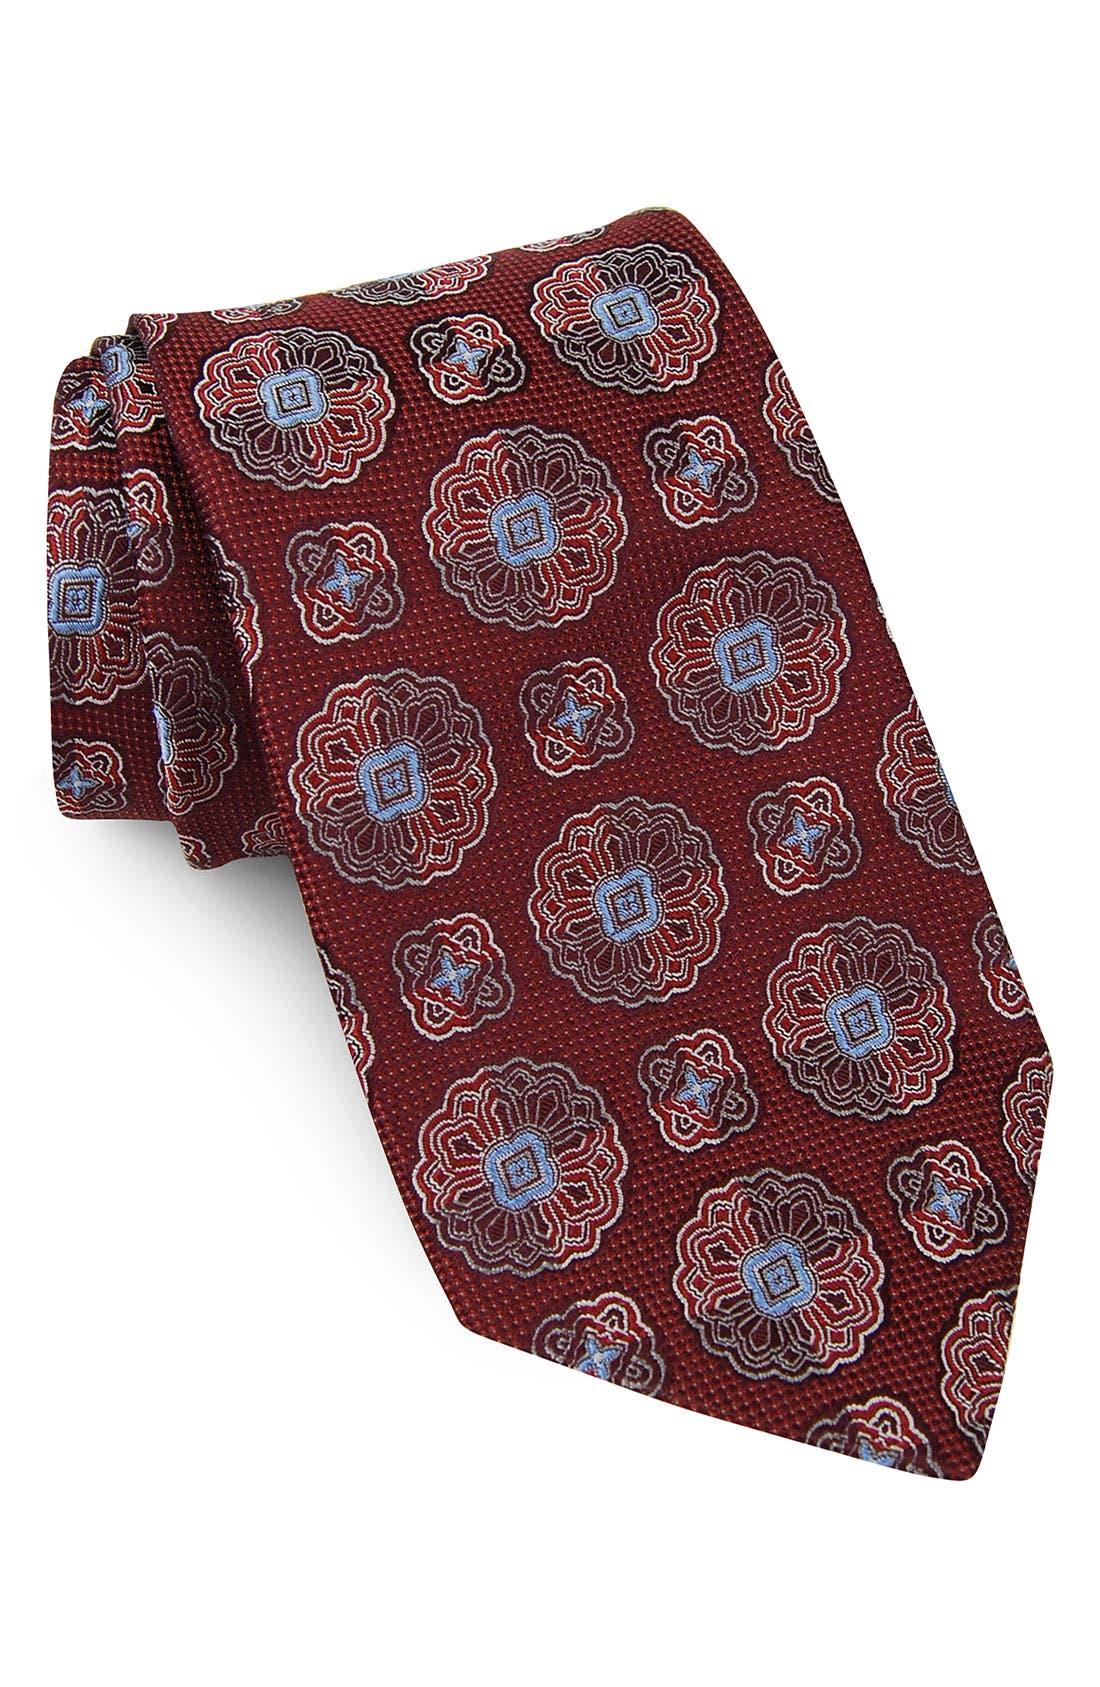 Main Image - John W. Nordstrom® 'Neat Peat' Woven Silk Tie